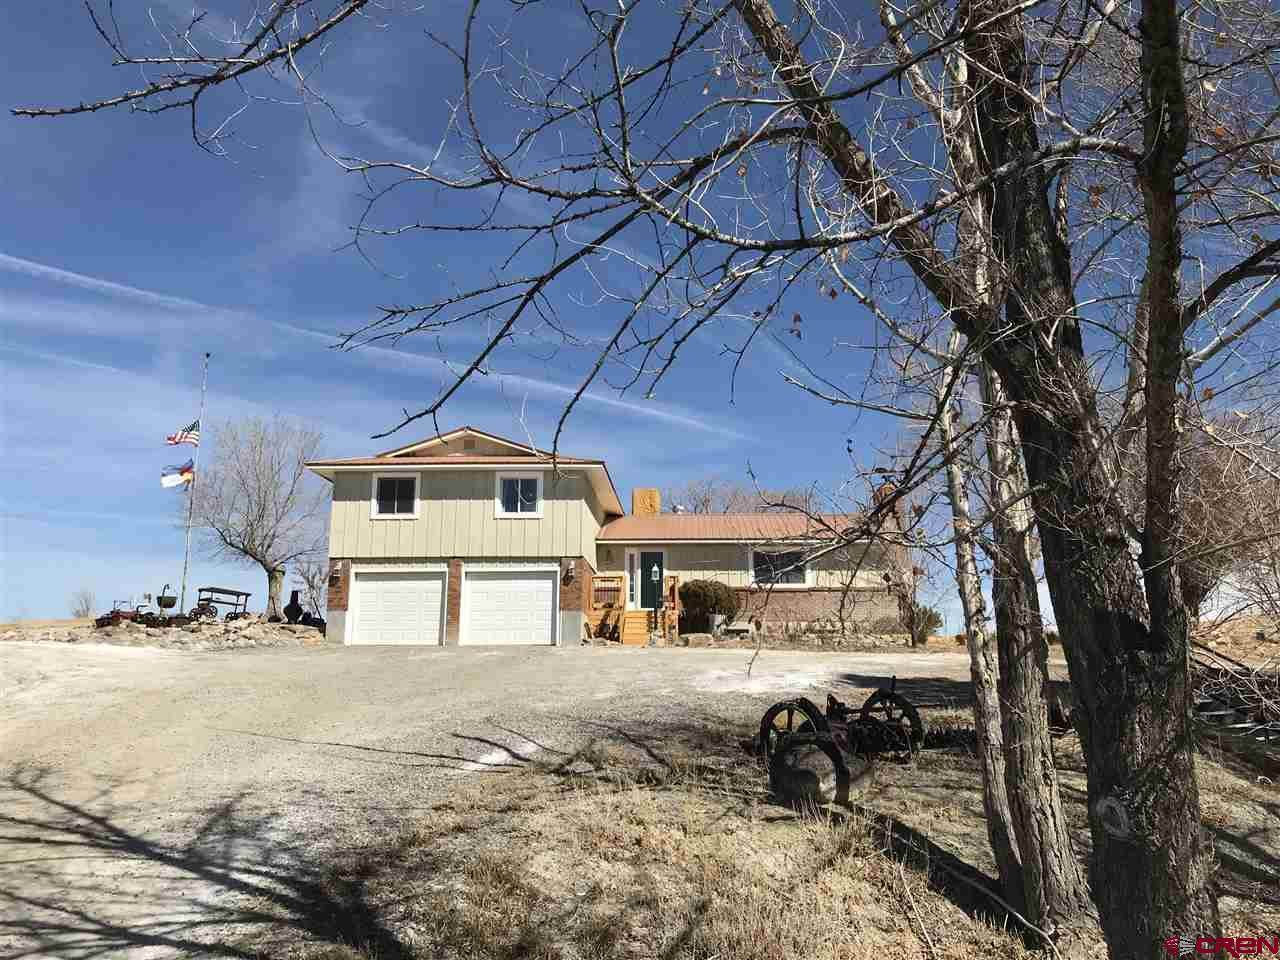 61953 Carnation Road, Olathe, Colorado 81425, 3 Bedrooms Bedrooms, ,2 BathroomsBathrooms,Residential,For Sale,61953 Carnation Road,779457